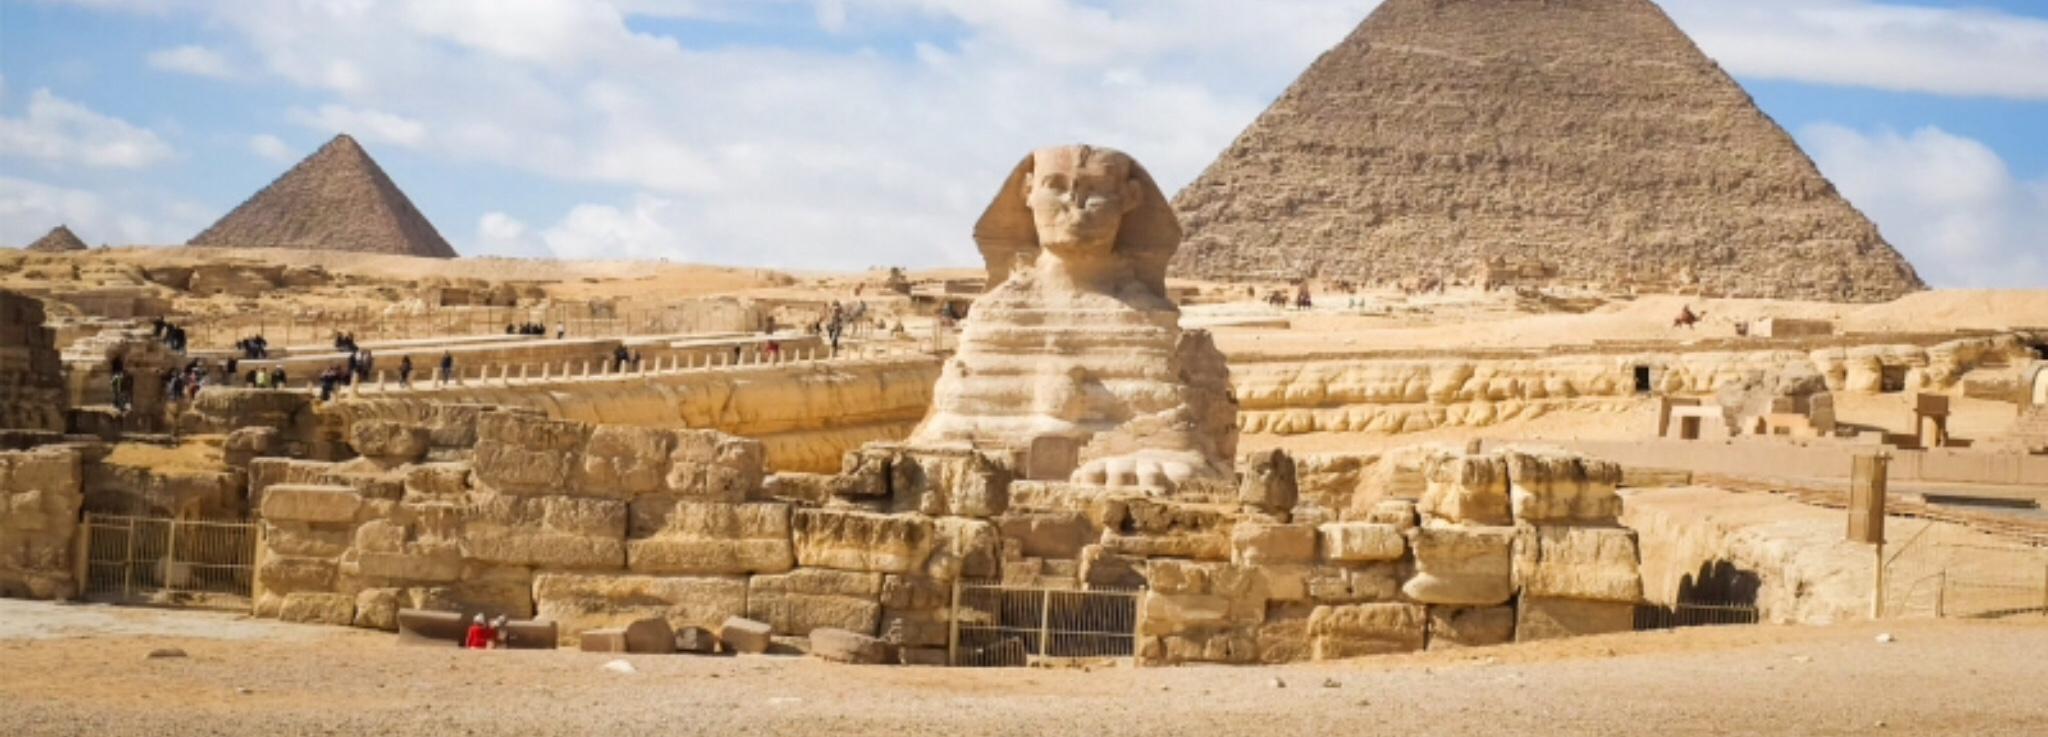 Egypt: Grand Museum opening postponed